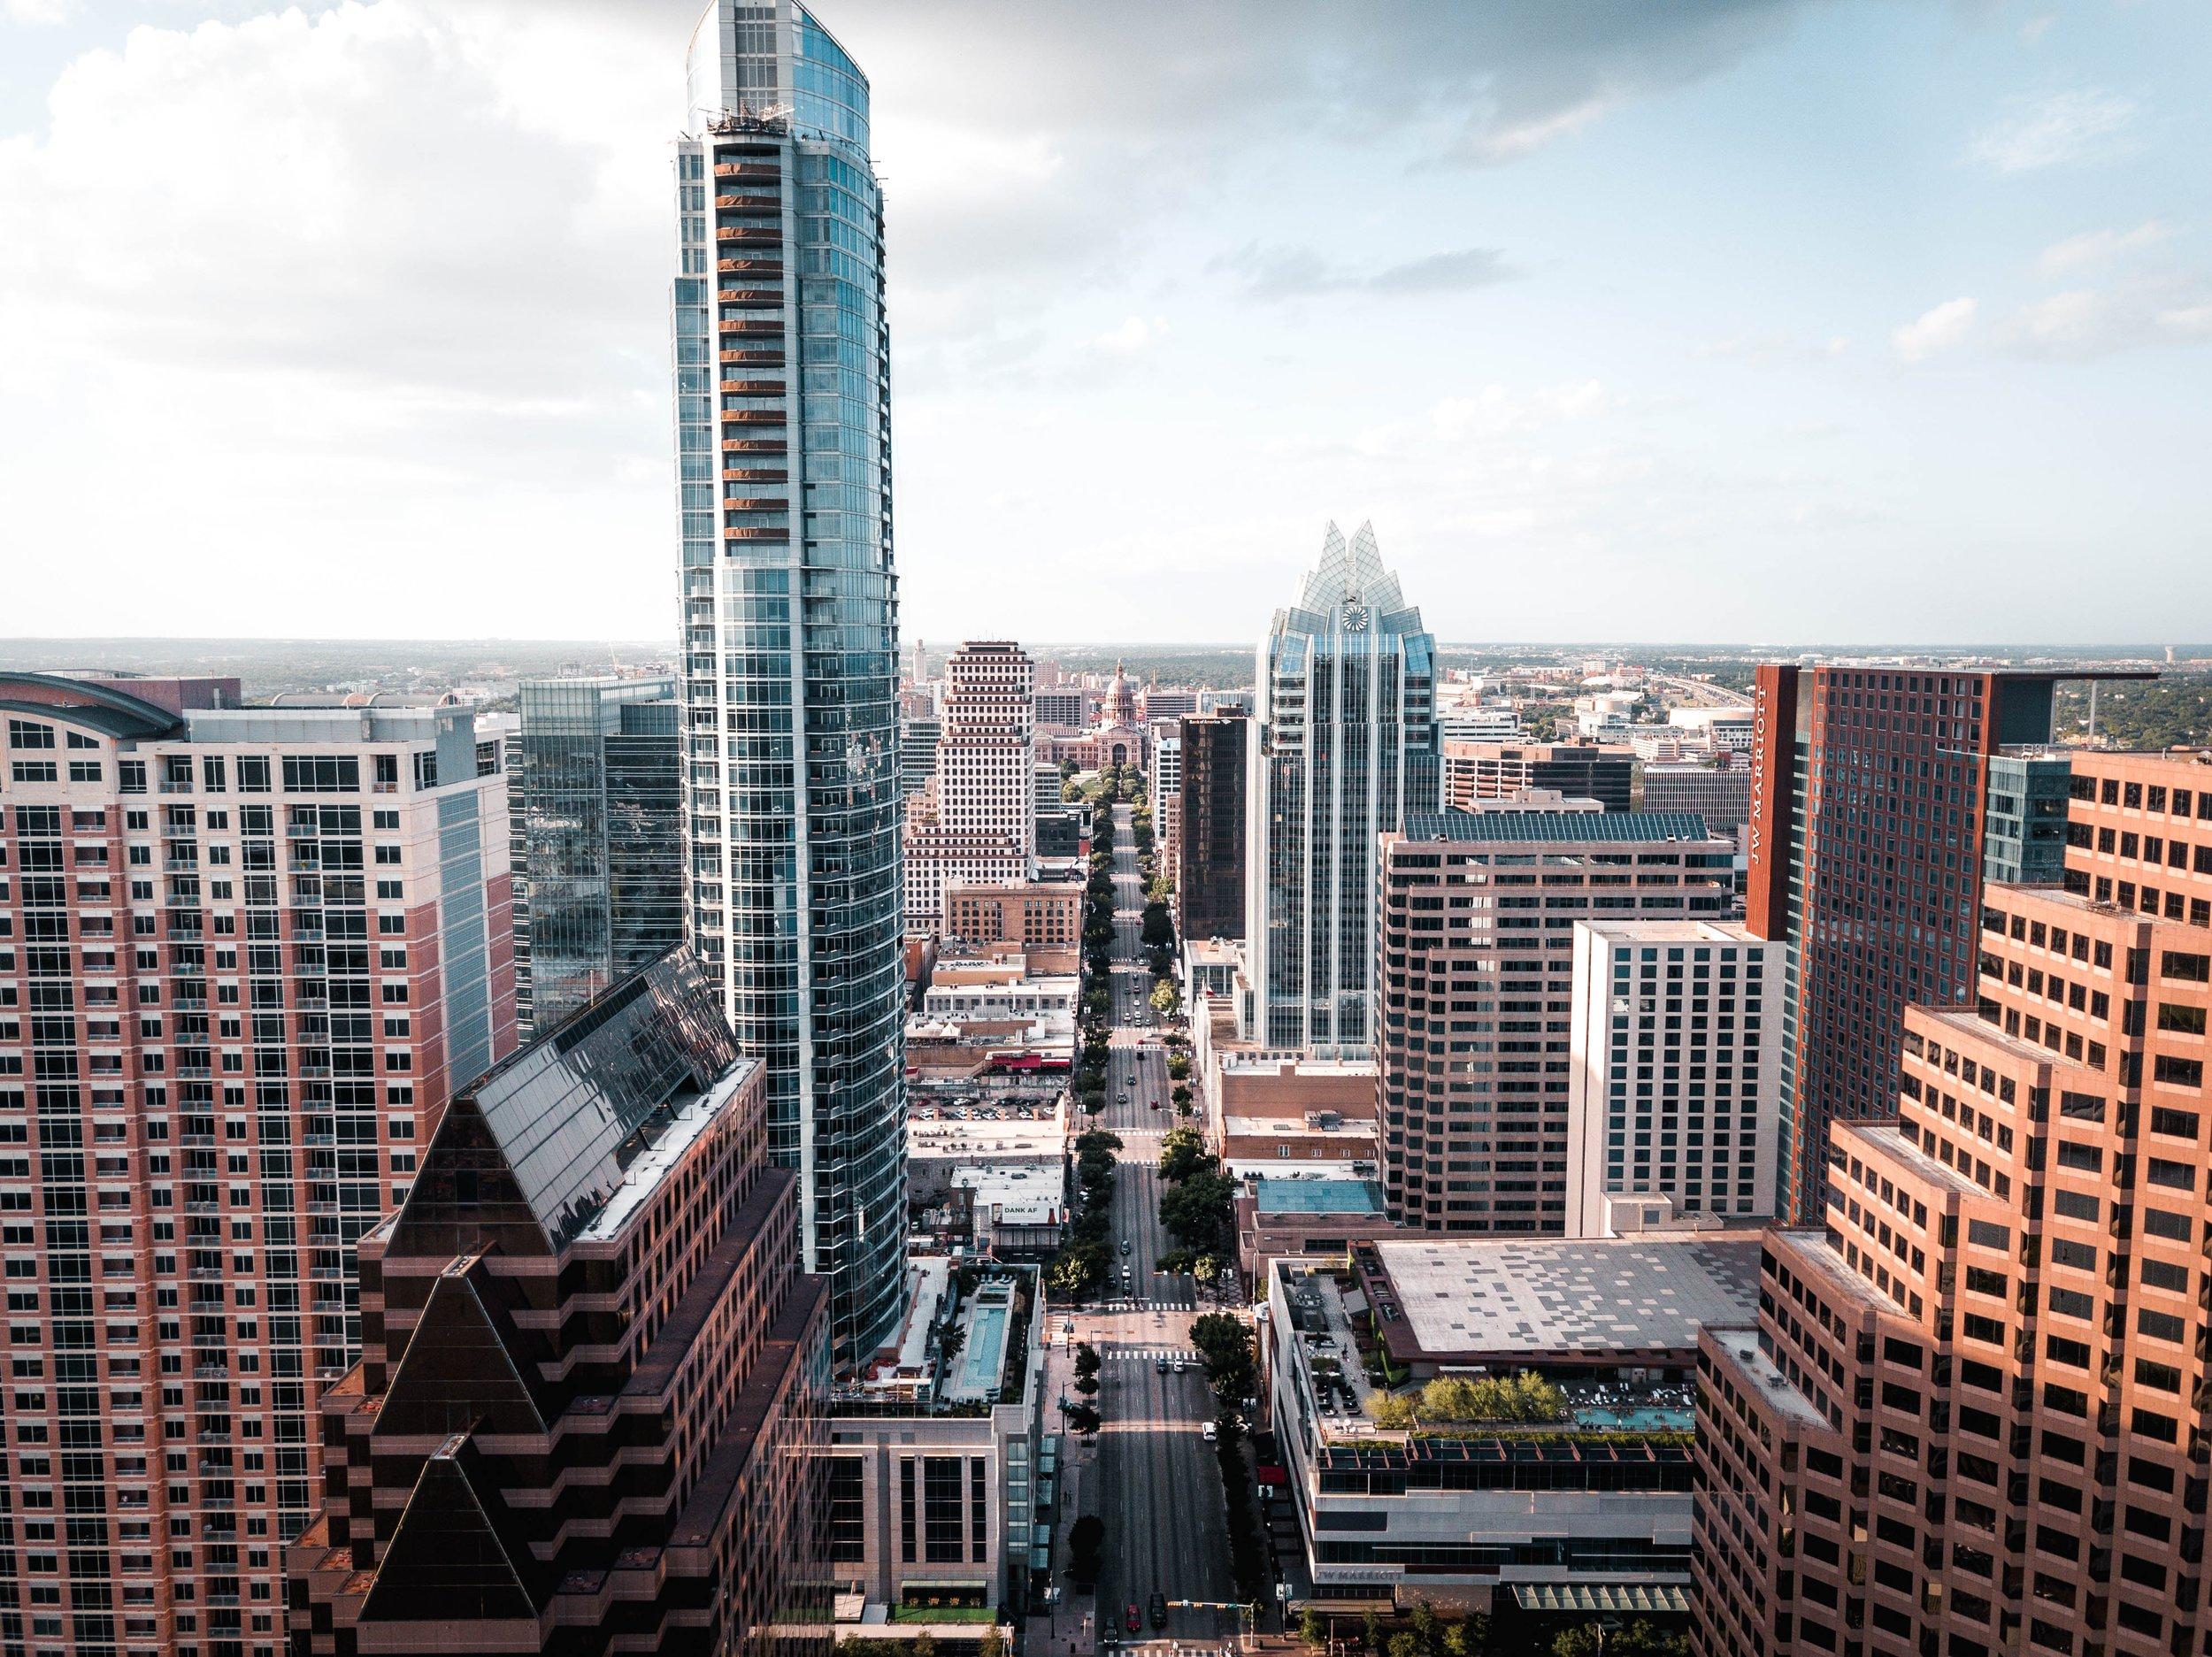 Location: Austin, TX 183 & Burnet -